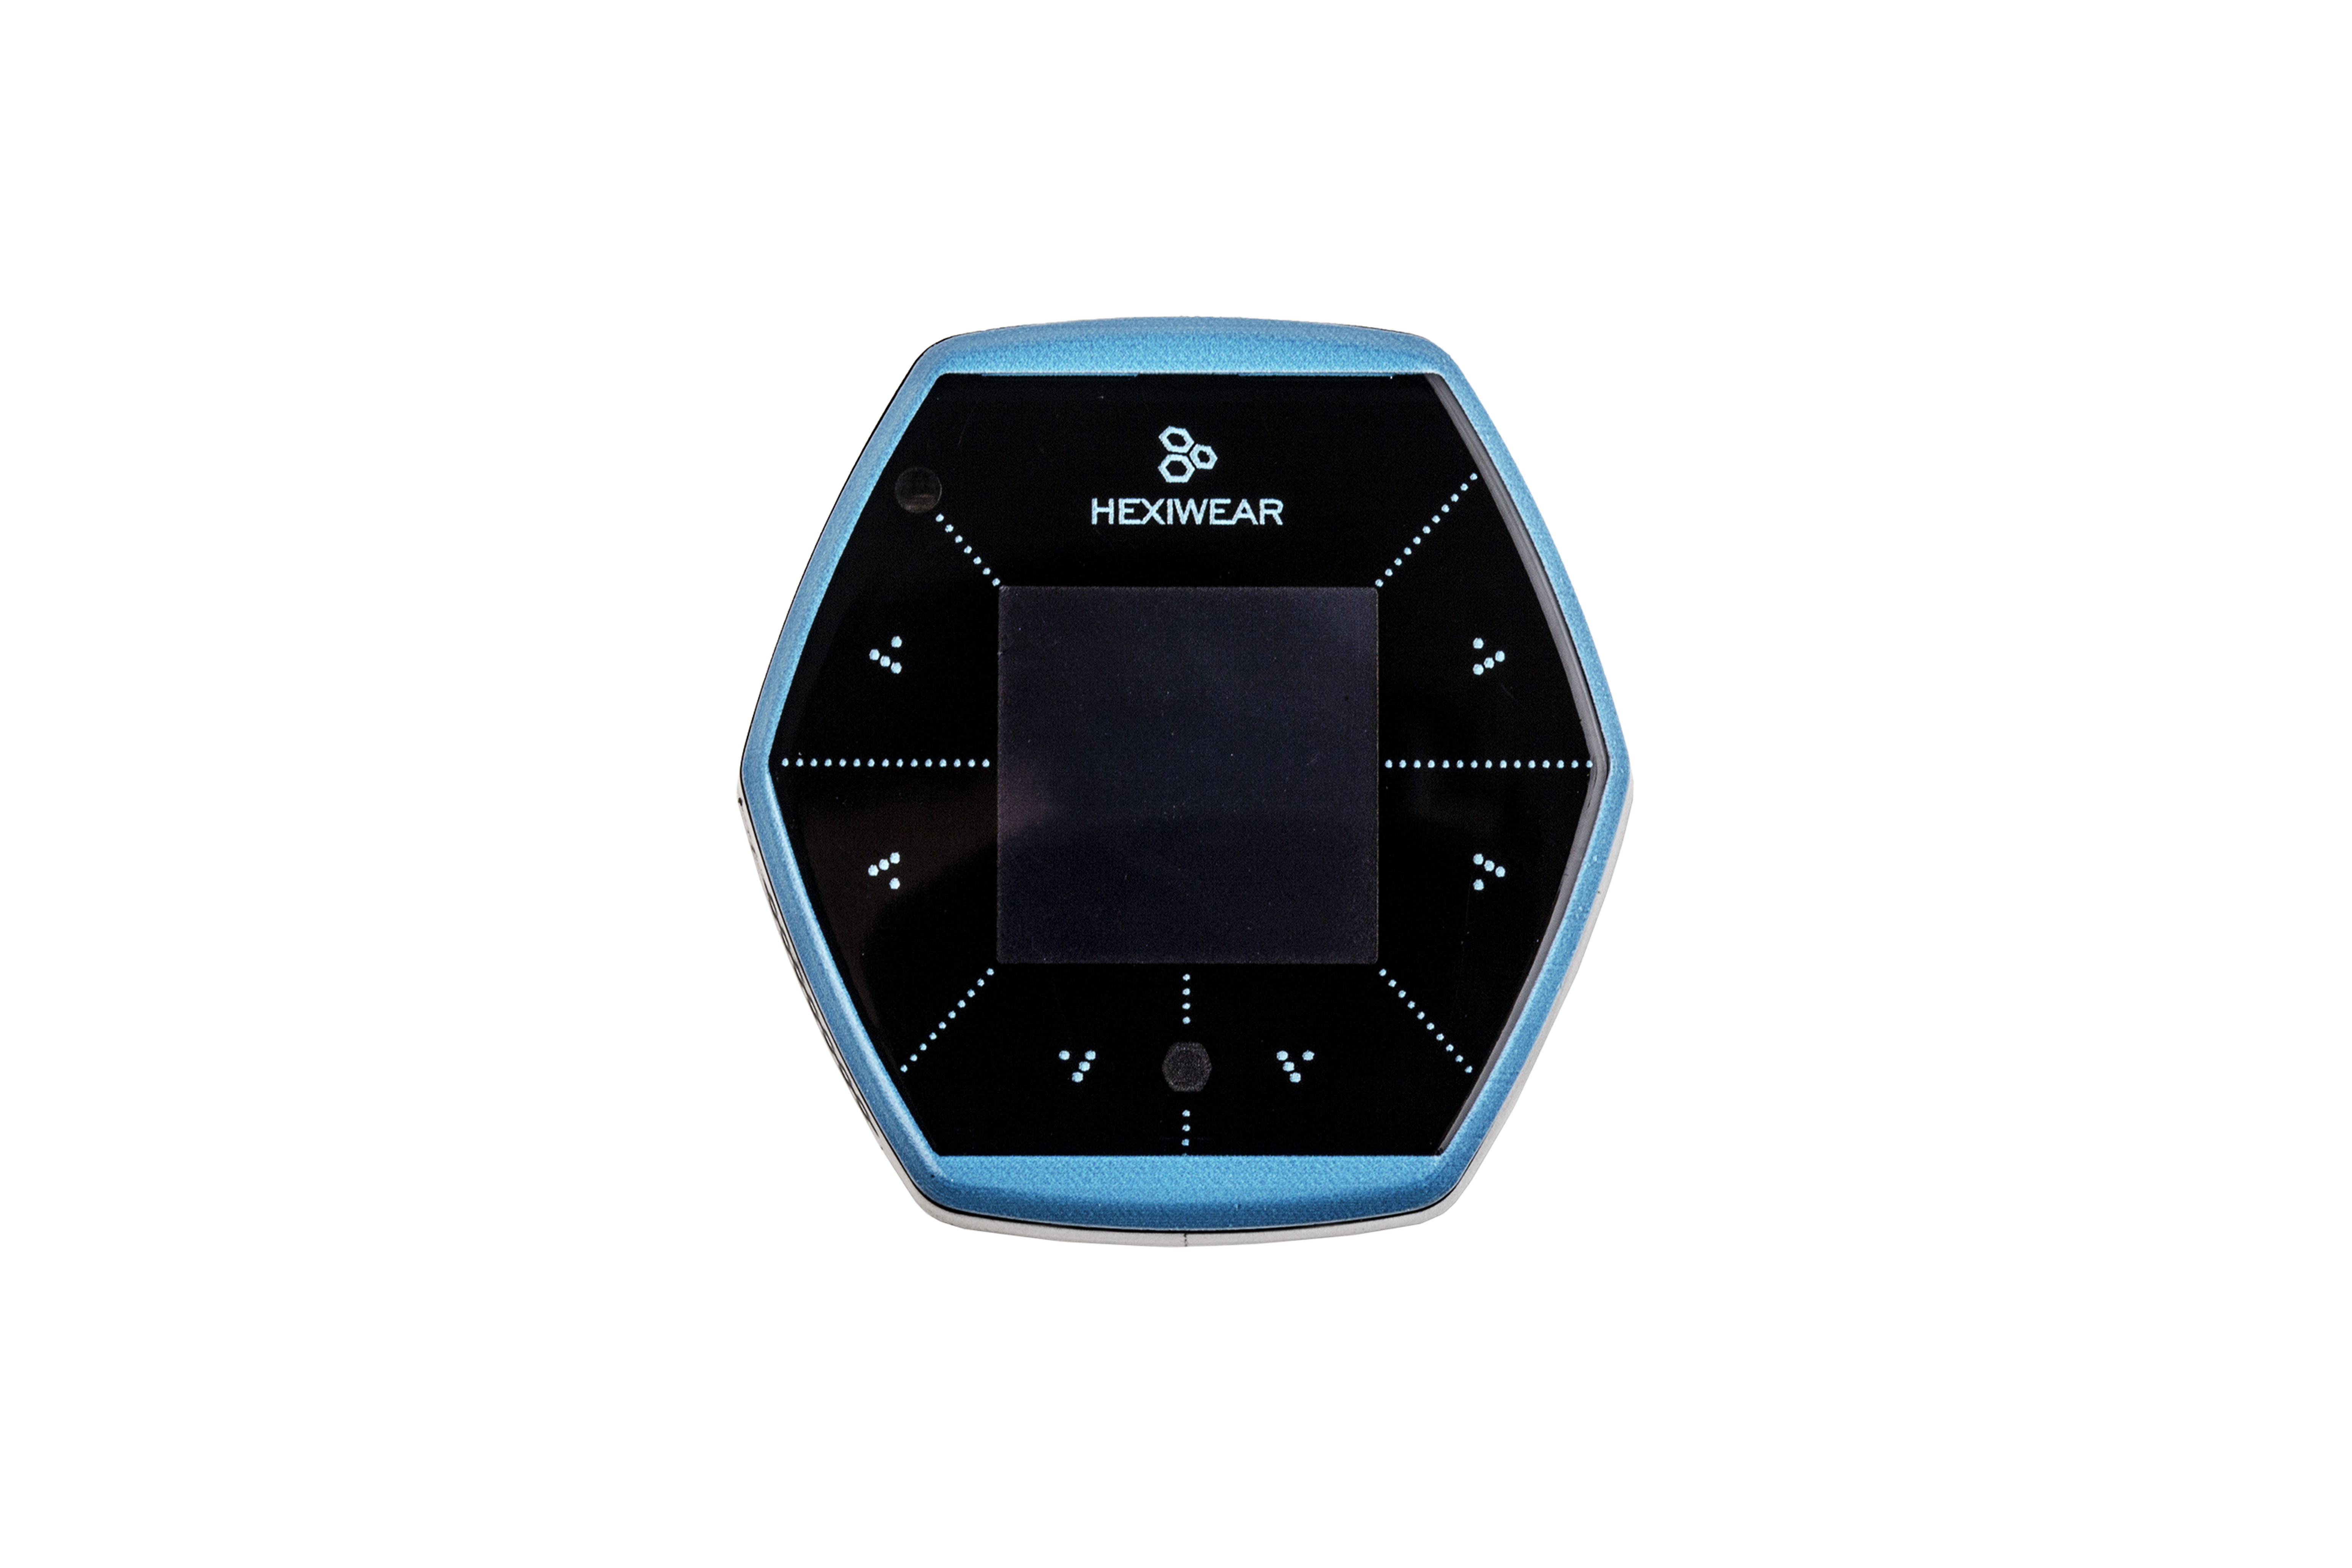 Kit sviluppo indossabile HEXiwear BLE per IoT